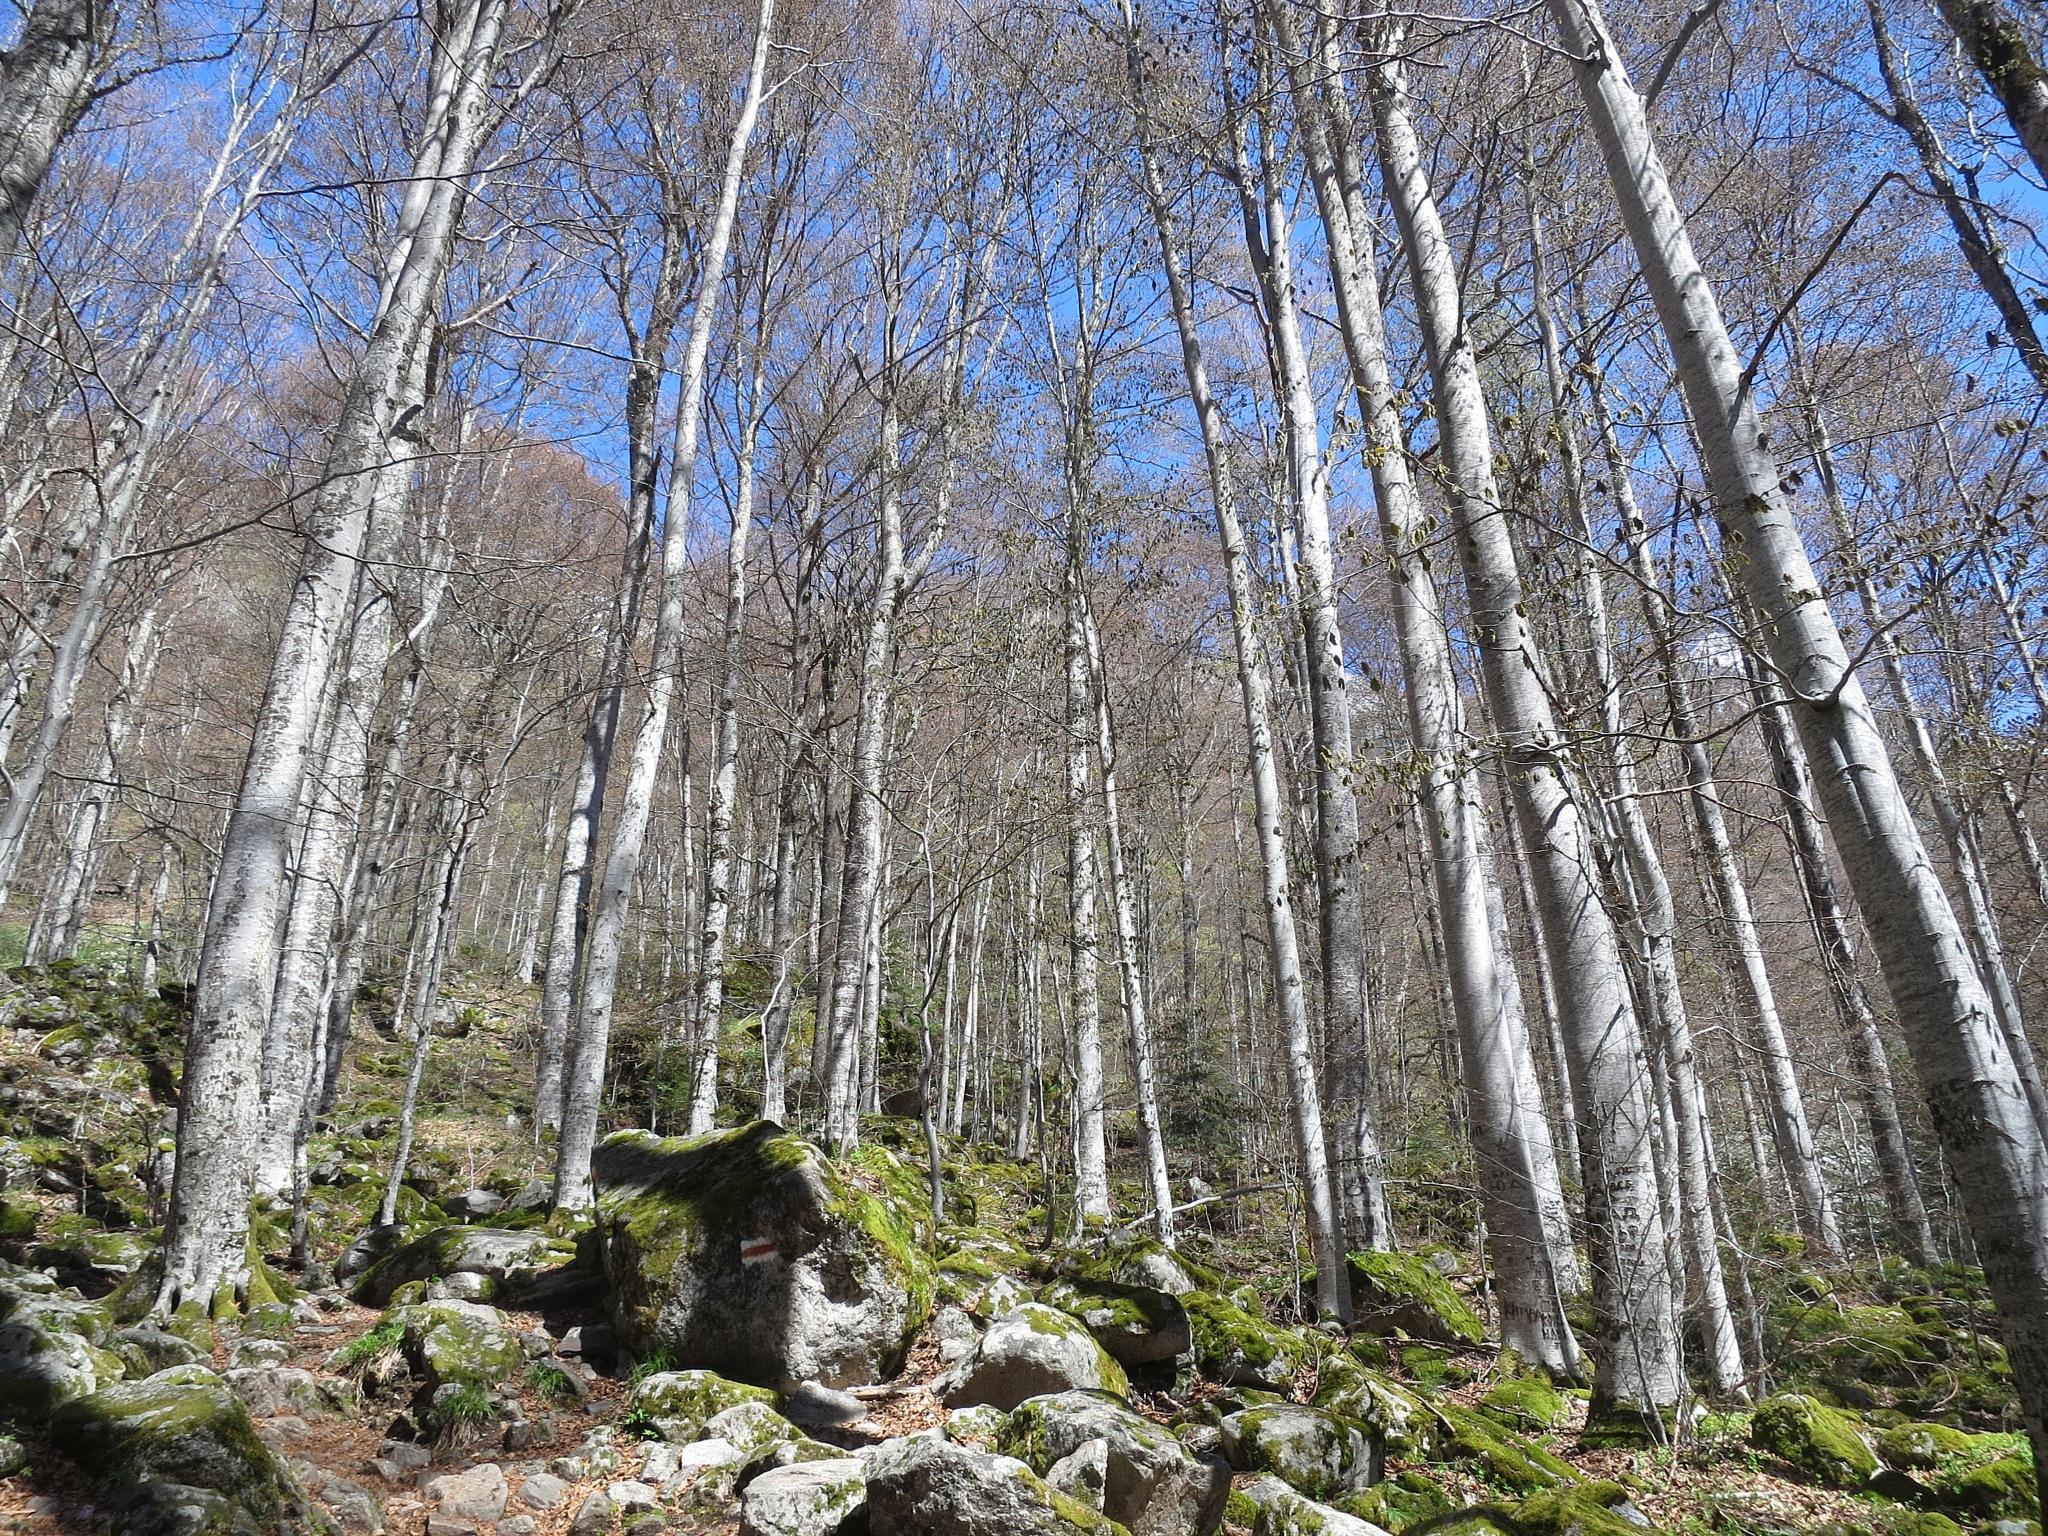 Bulgarian Nature 2 by GraemeLeePollard